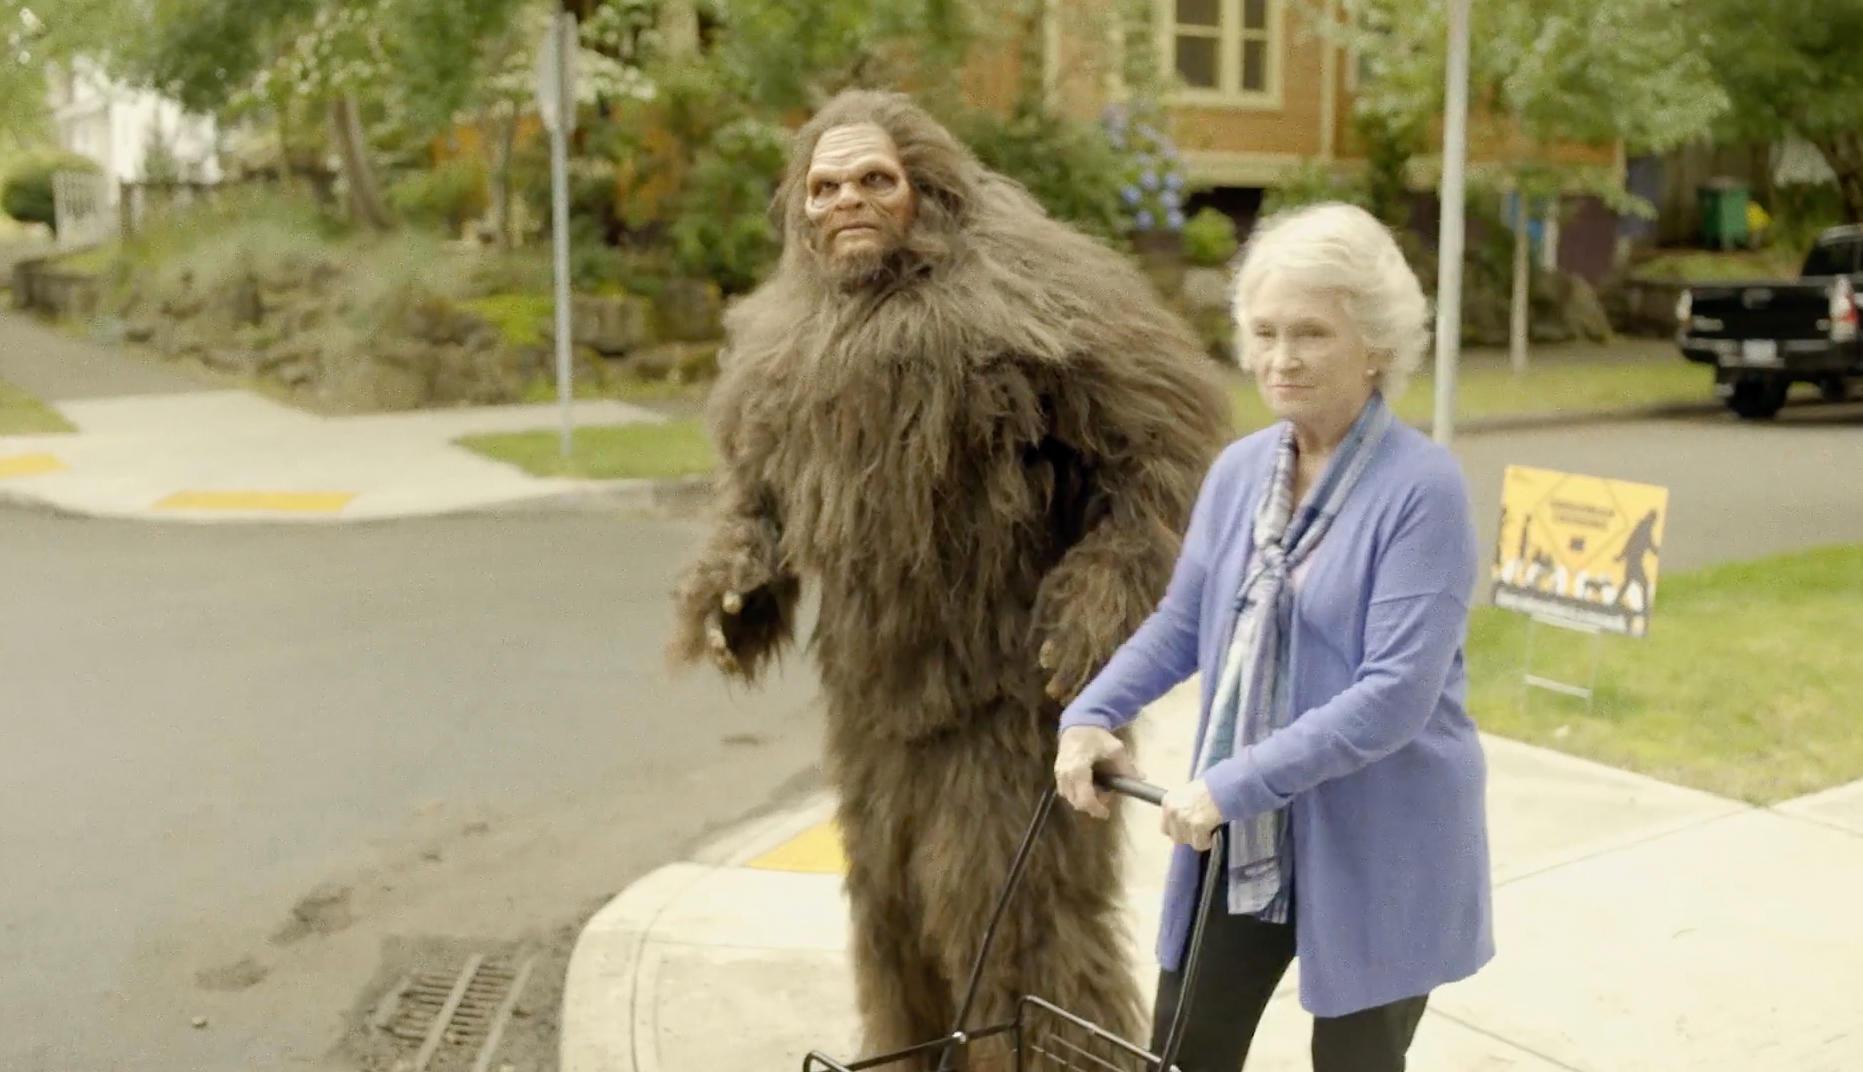 Bigfoot Crossing the Street